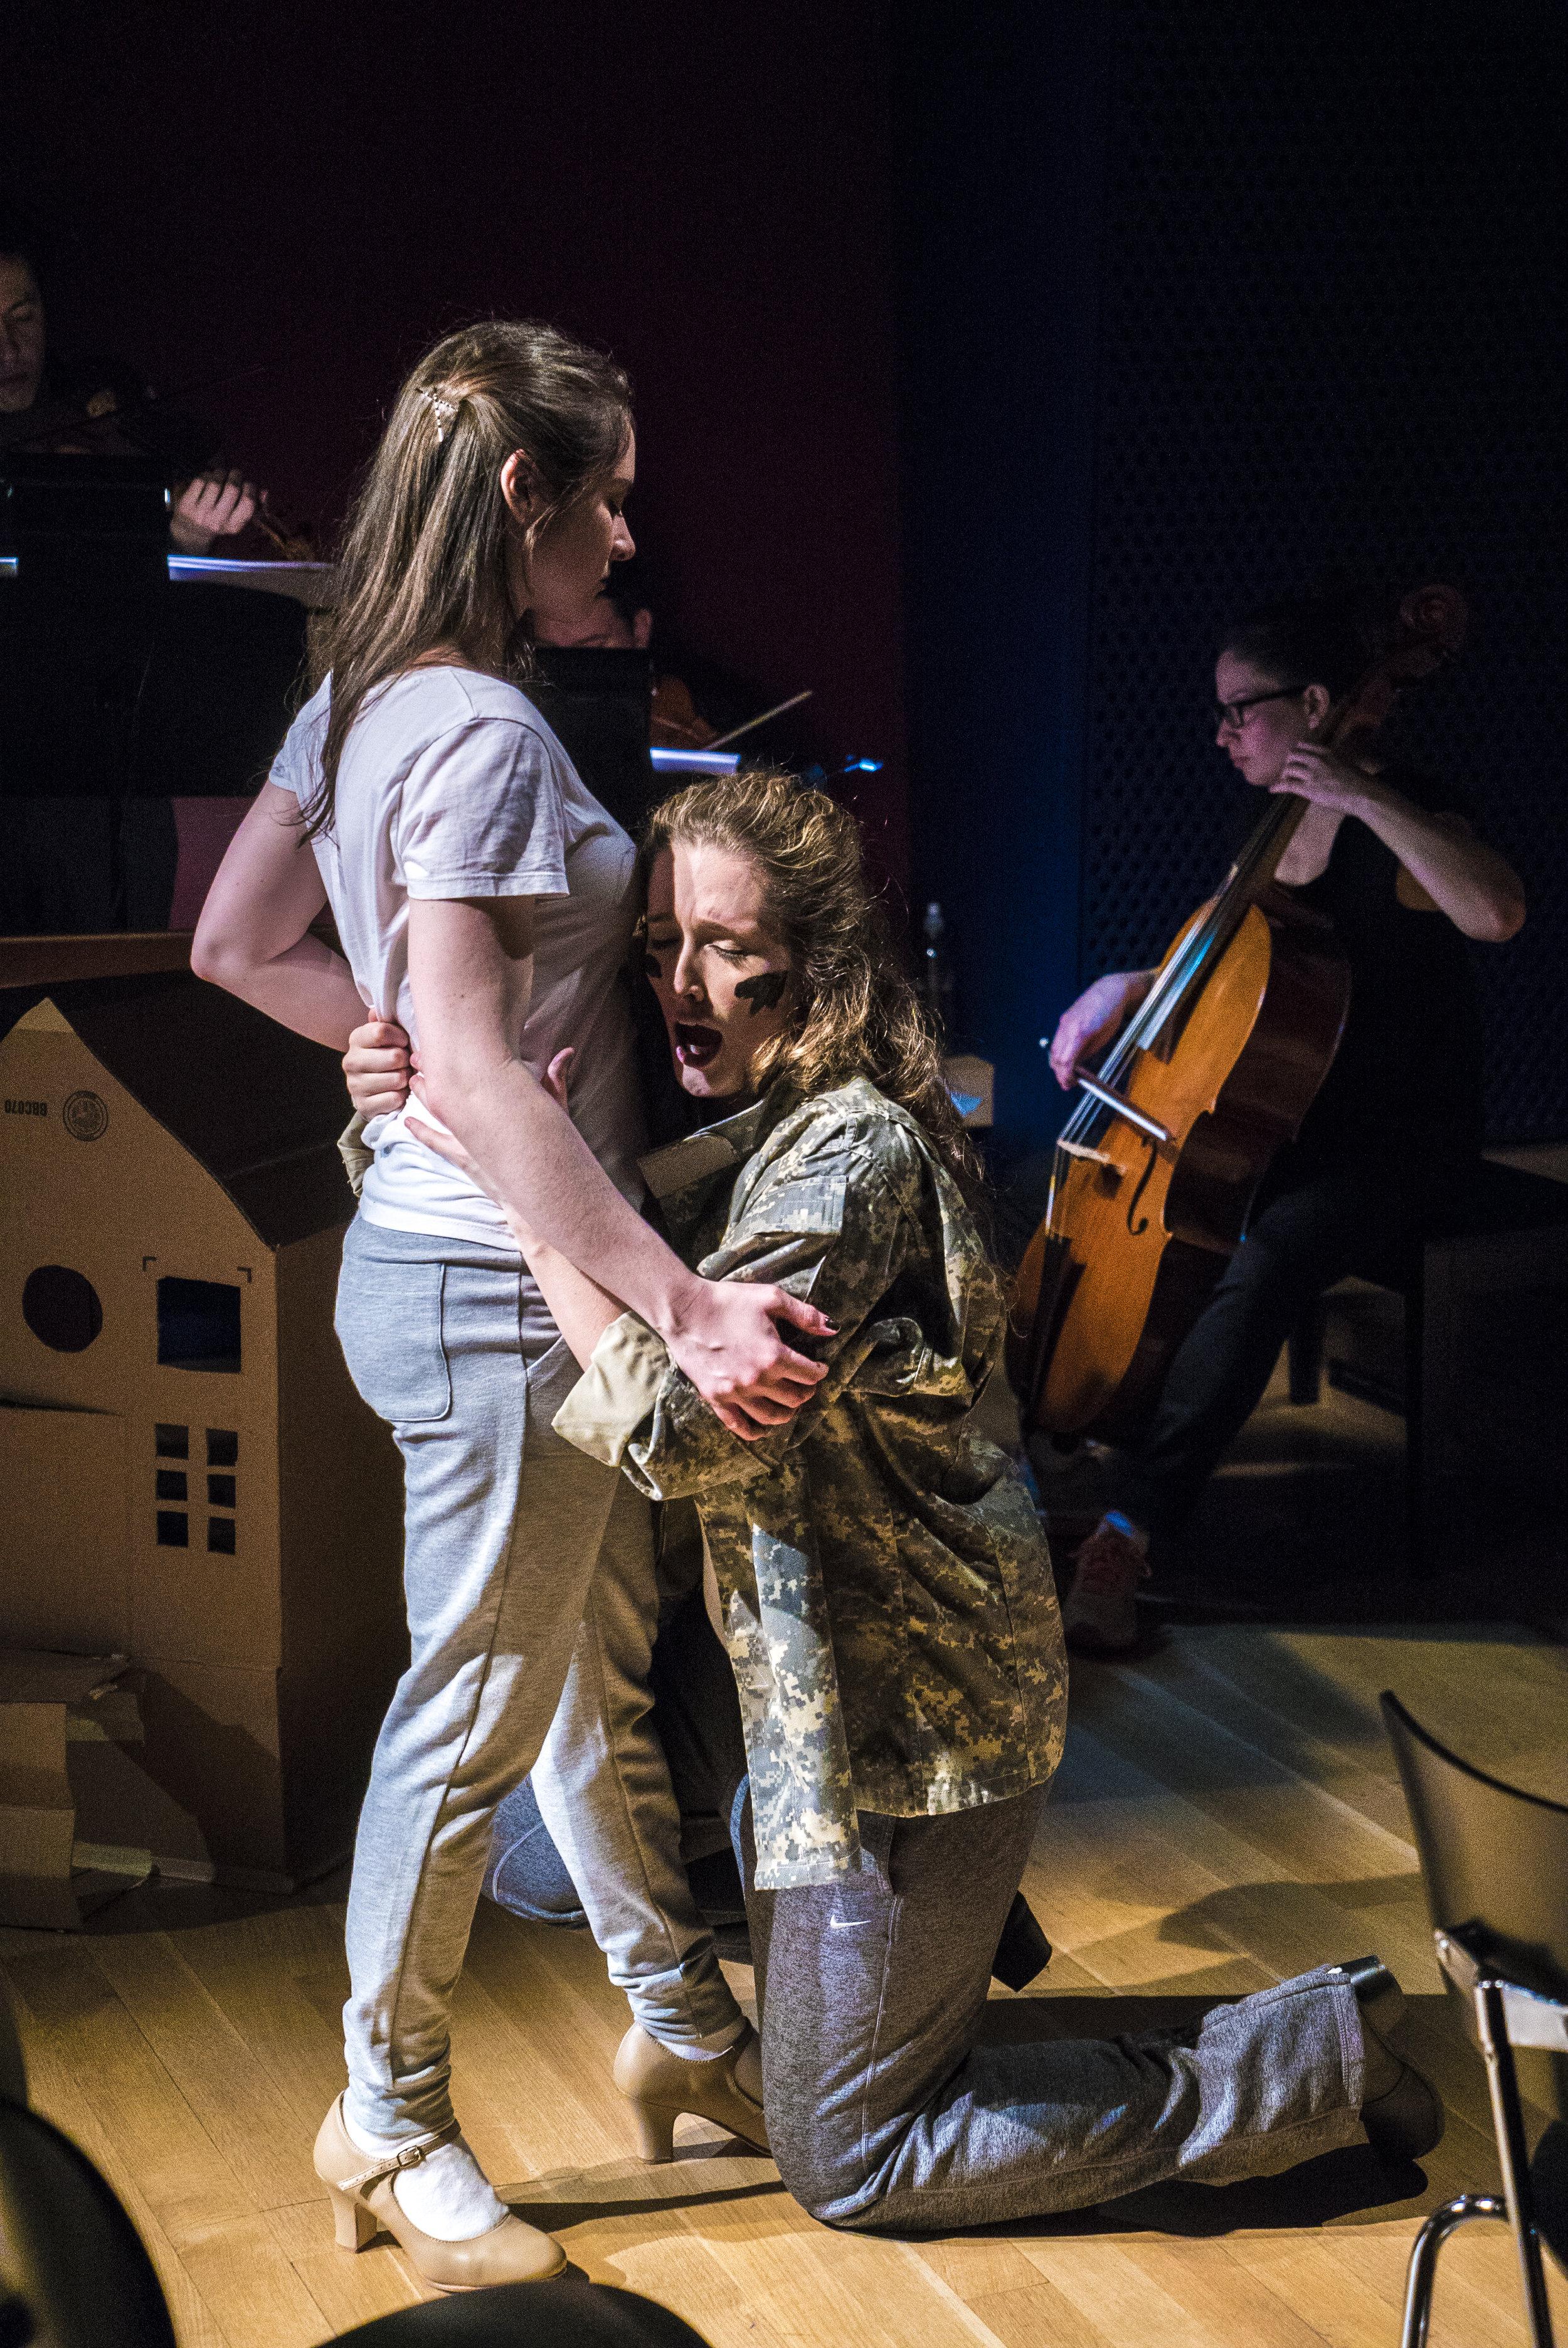 Marisa Karchin, Kimberly Hann. Photo credit: Lucas Godlewski